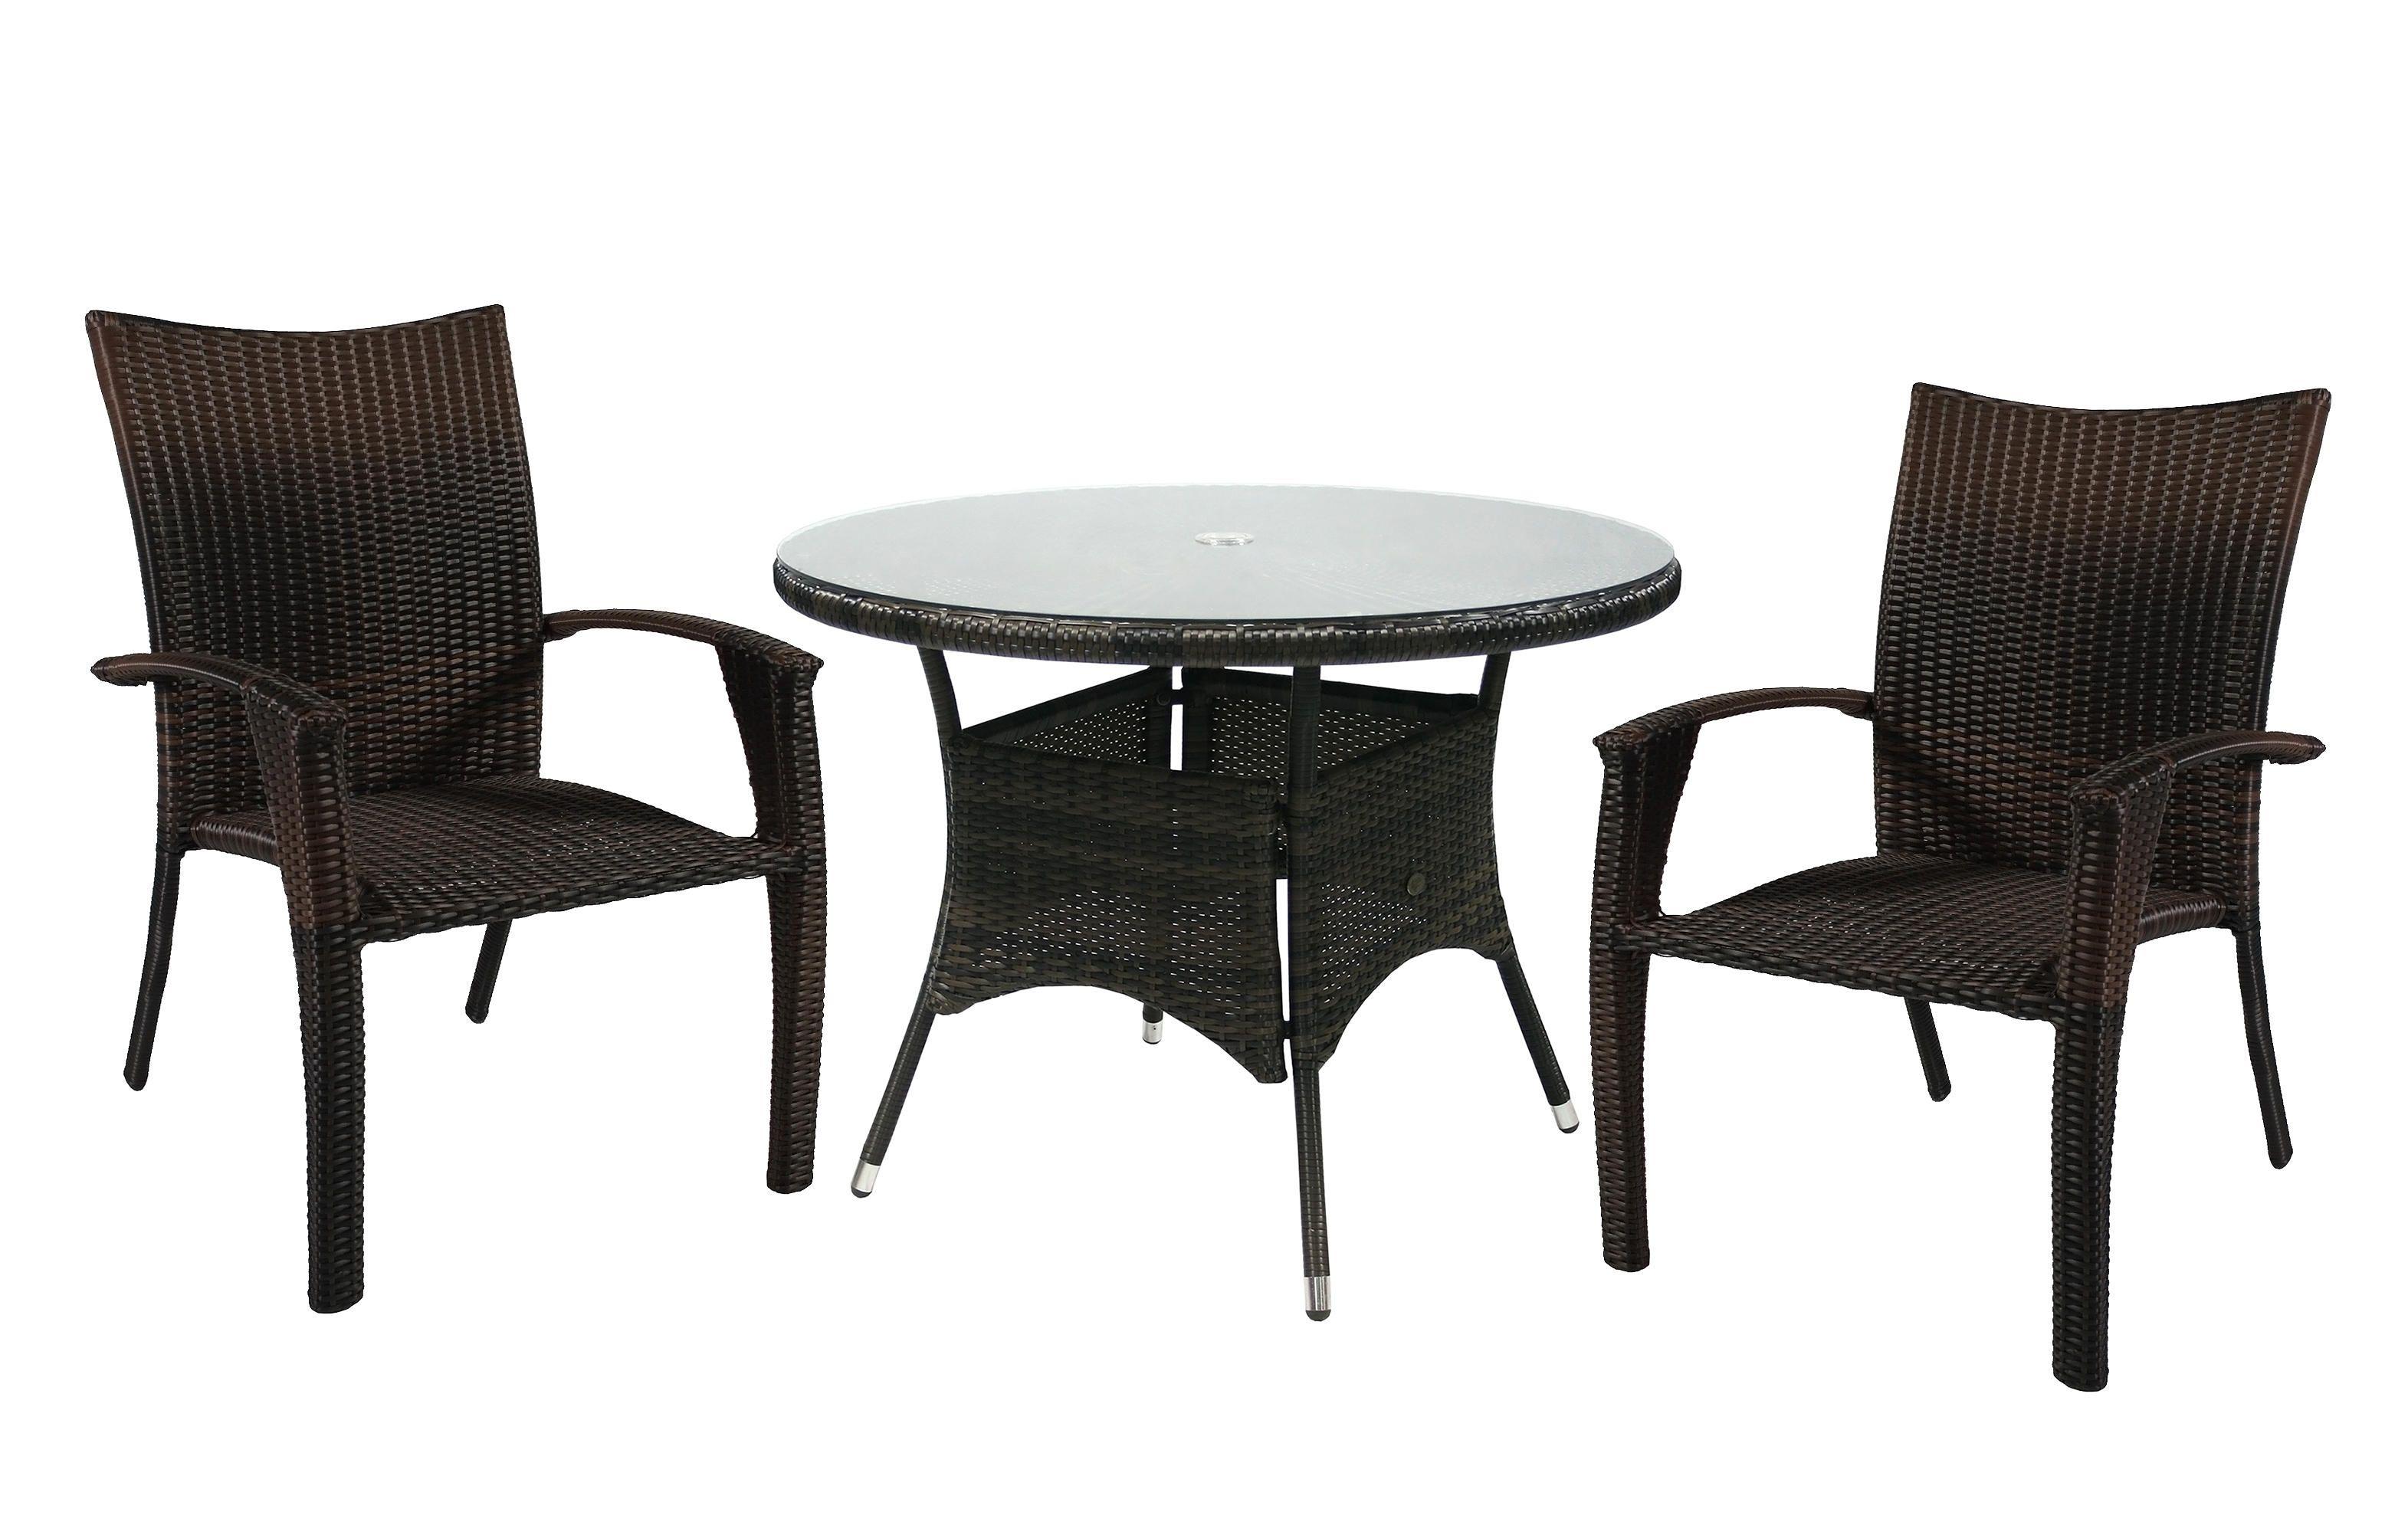 Комплект мебели WICKER Garden4you 13323, 12698  темно-коричневый